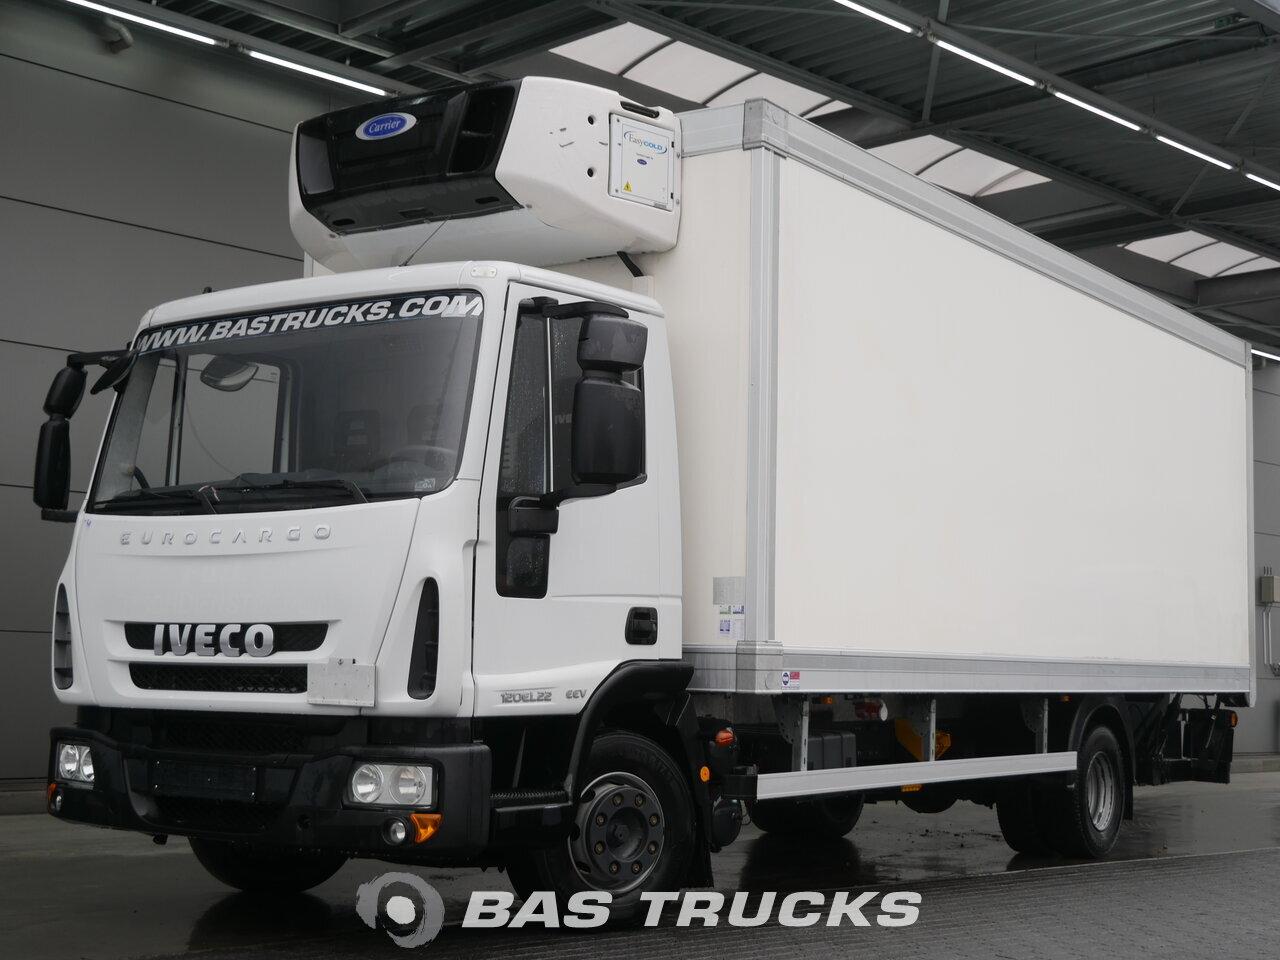 photo of Used Truck IVECO Eurocargo ML120EL22 4X2 2013